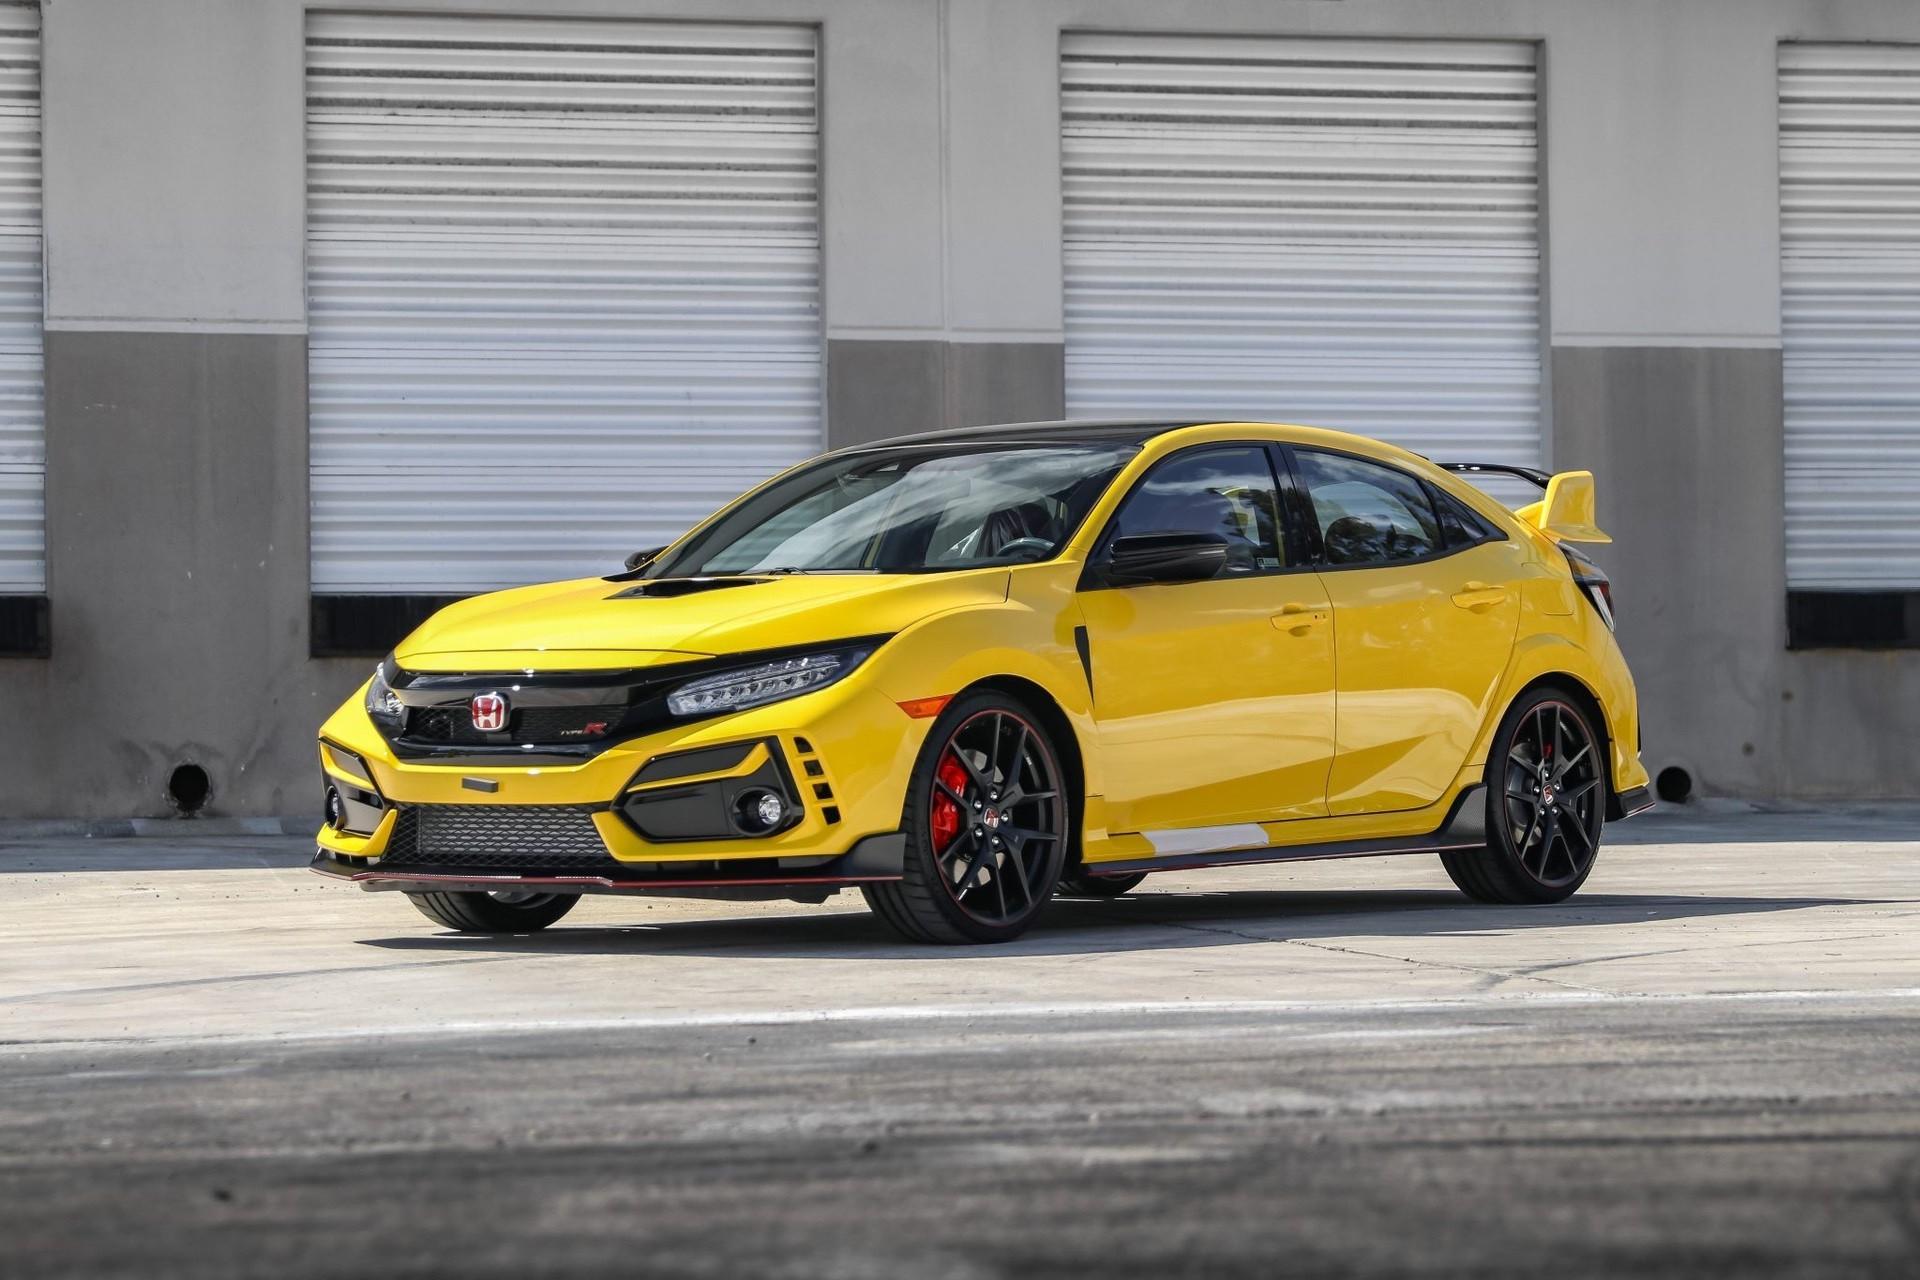 2021_Honda_Civic_Type_R_Limited_Edition-0000